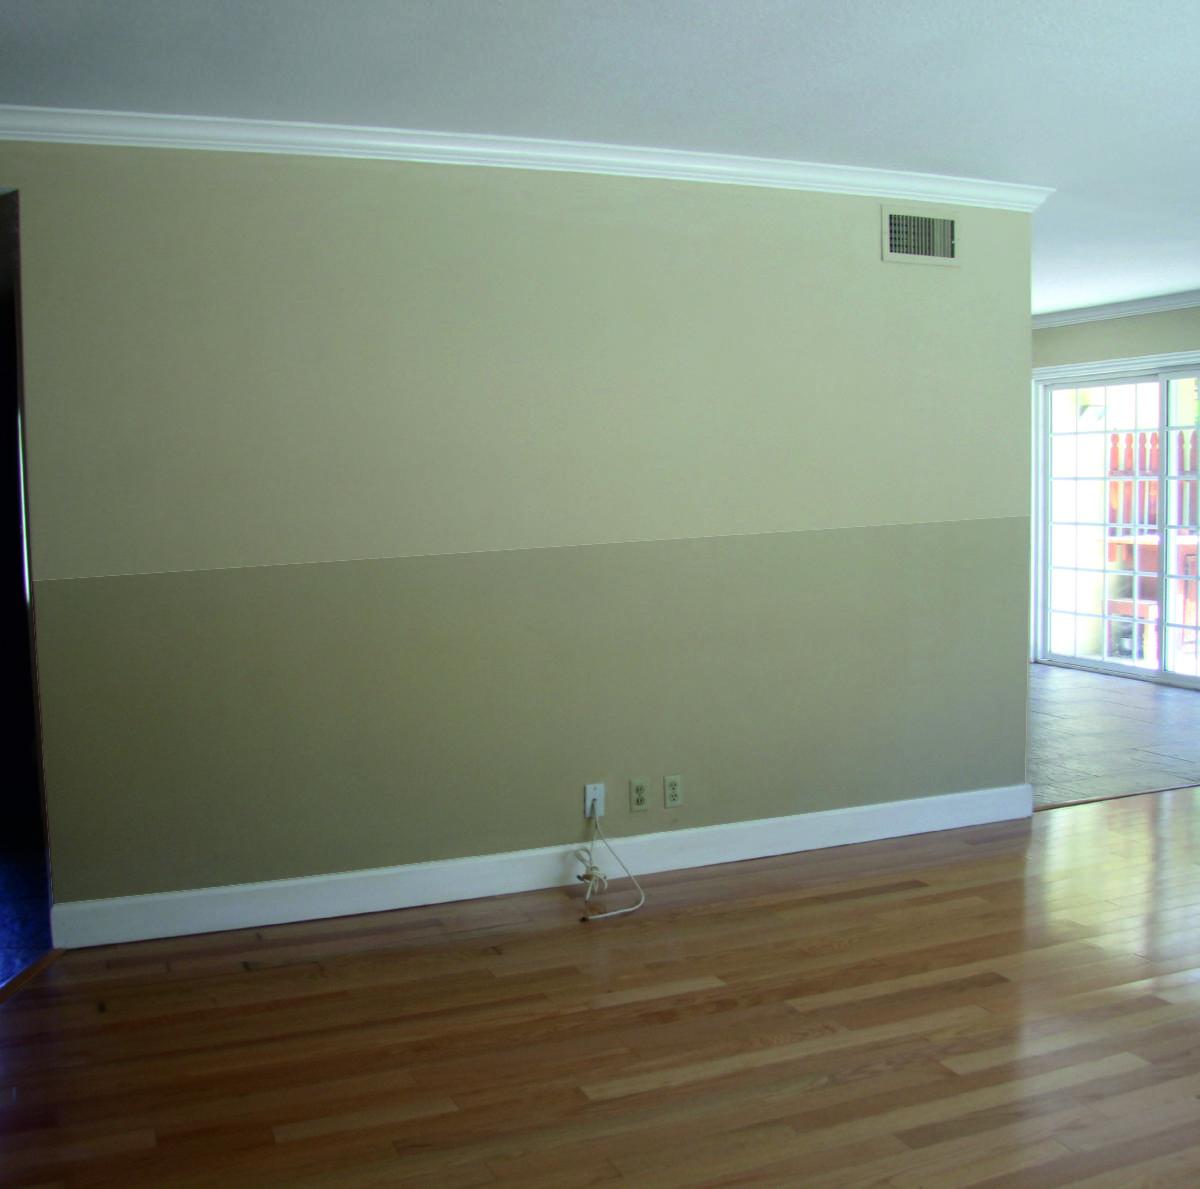 wandschutz kuche sitzecke m bel ideen innenarchitektur. Black Bedroom Furniture Sets. Home Design Ideas